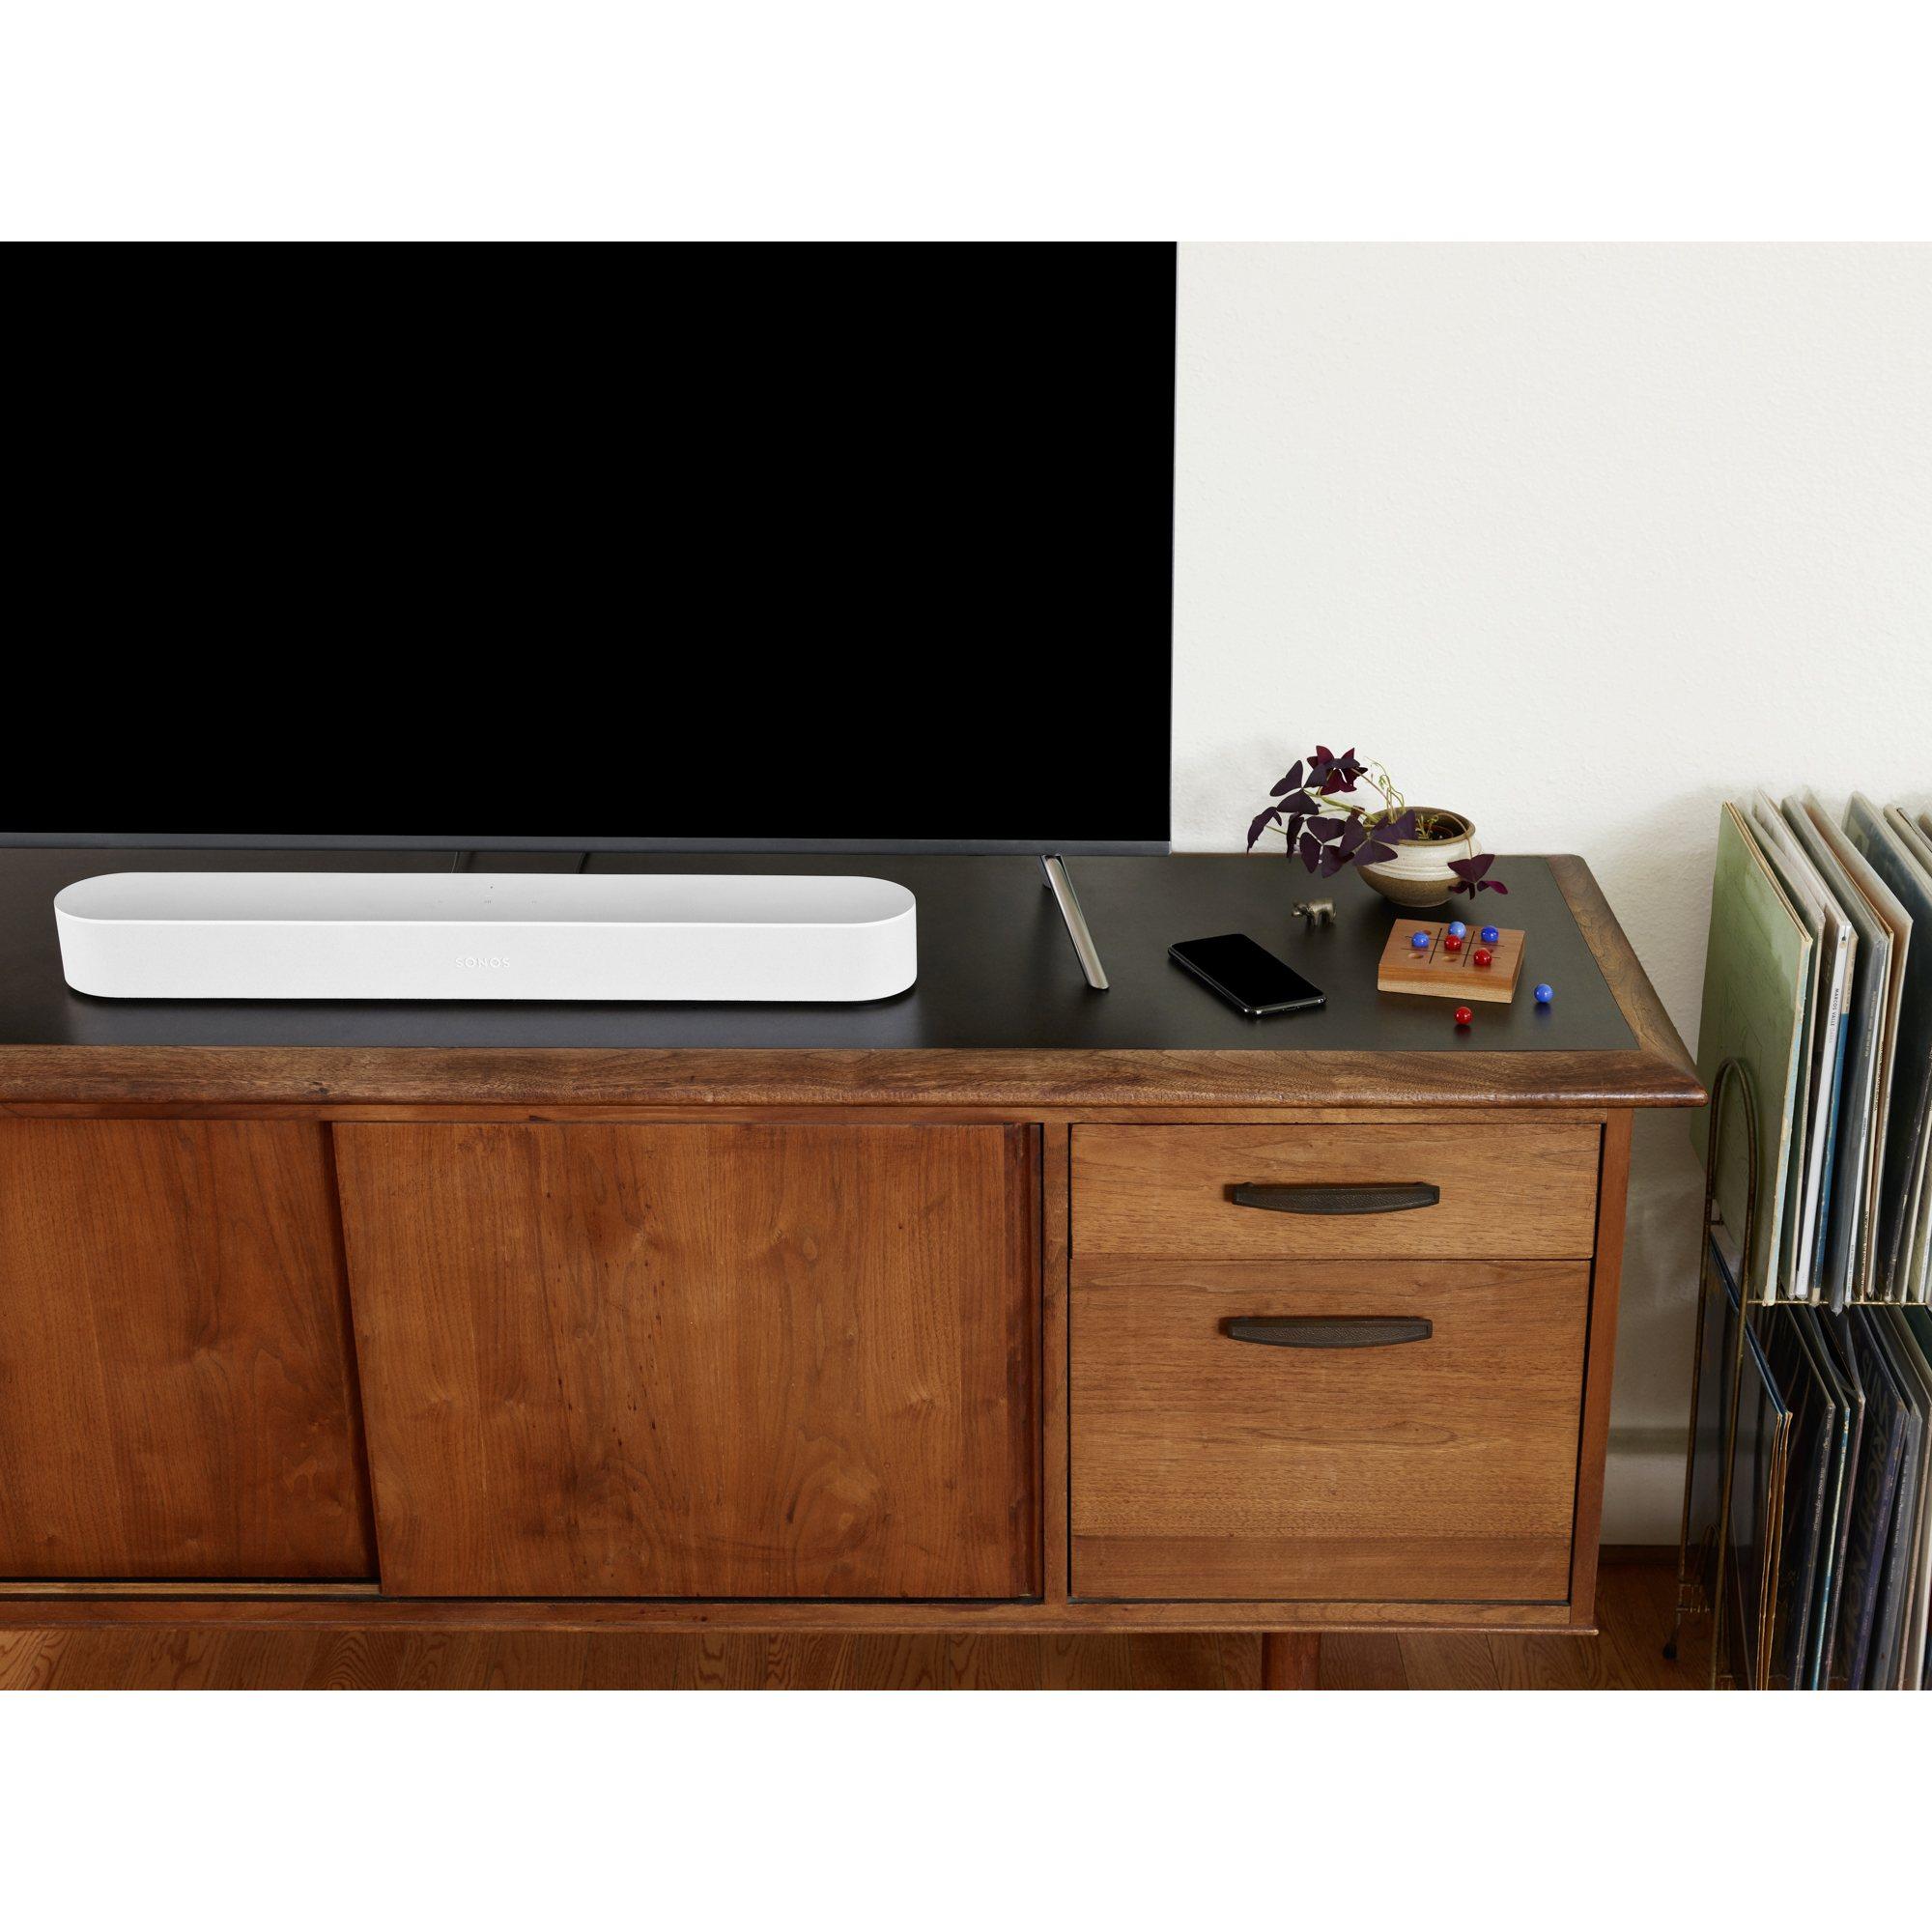 Sonos Beam Smart Soundbar with Amazon Alexa - White